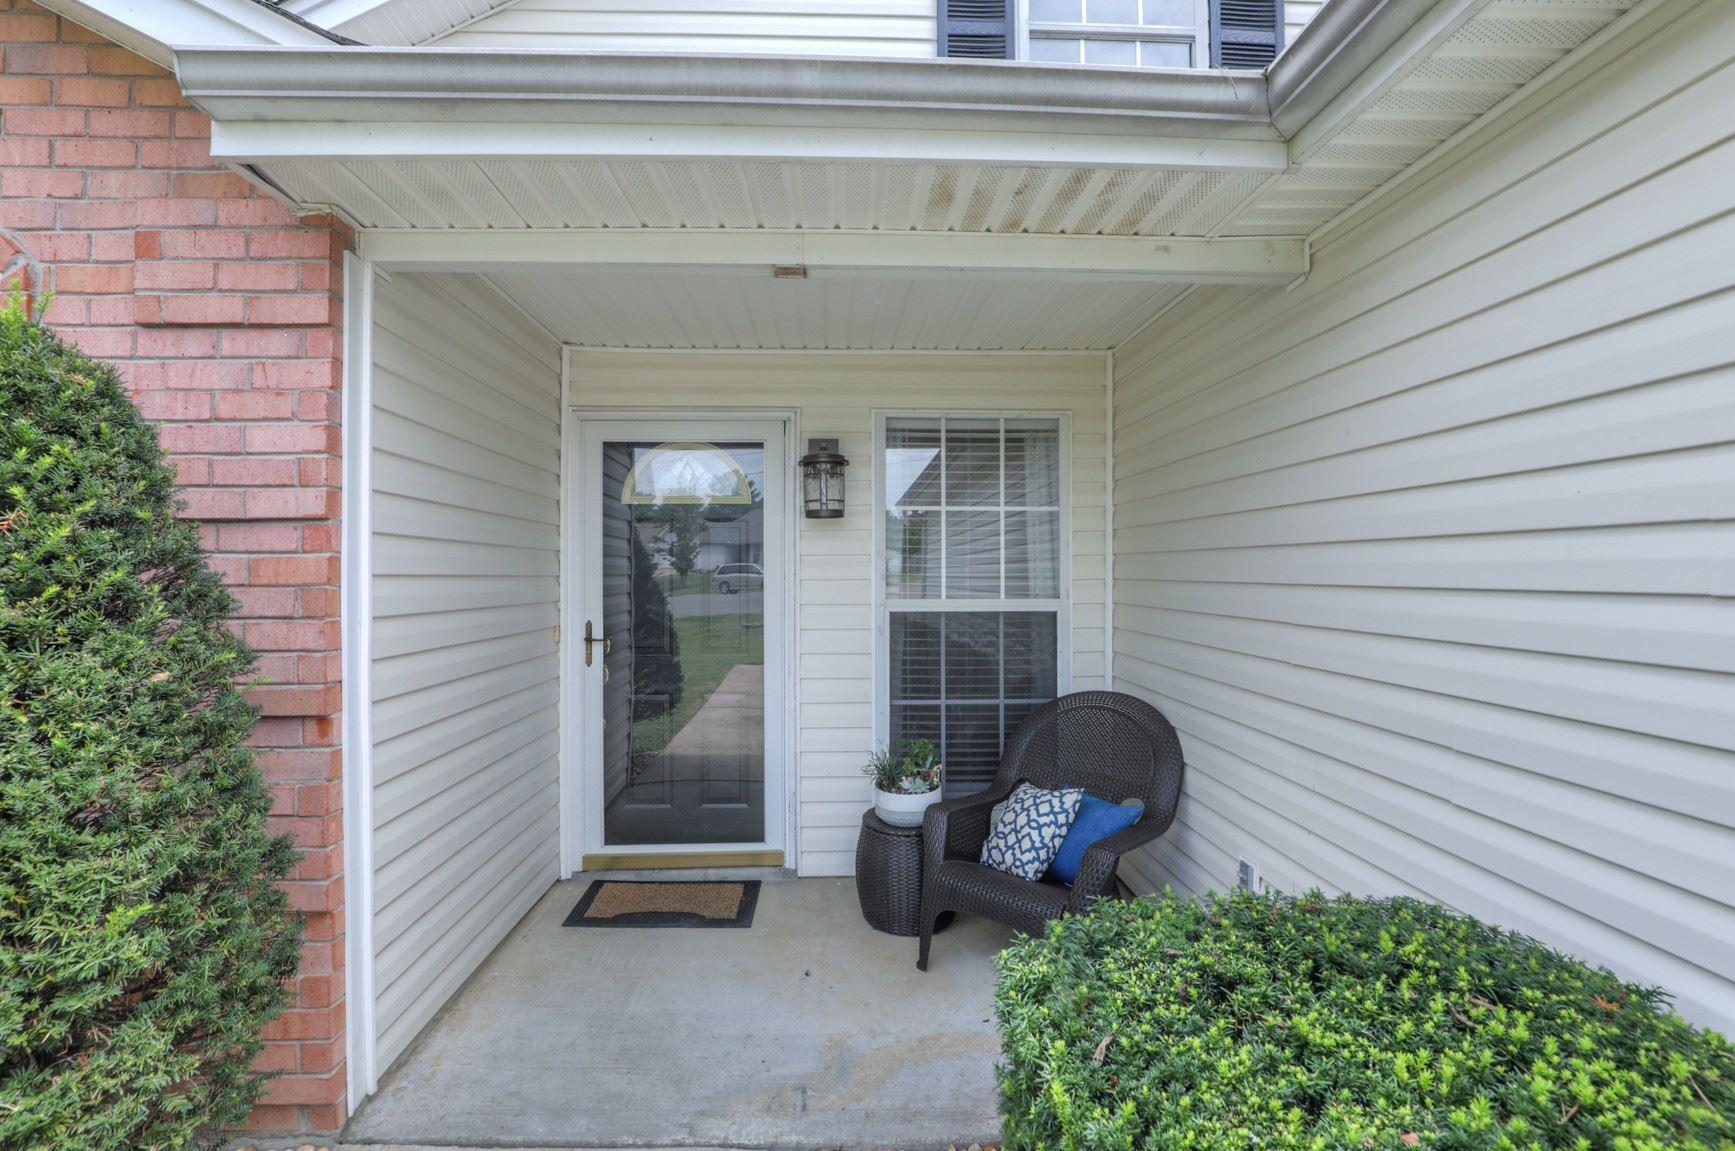 Photo of 4012 Amber Way, Spring Hill, TN 37174 (MLS # 2179273)